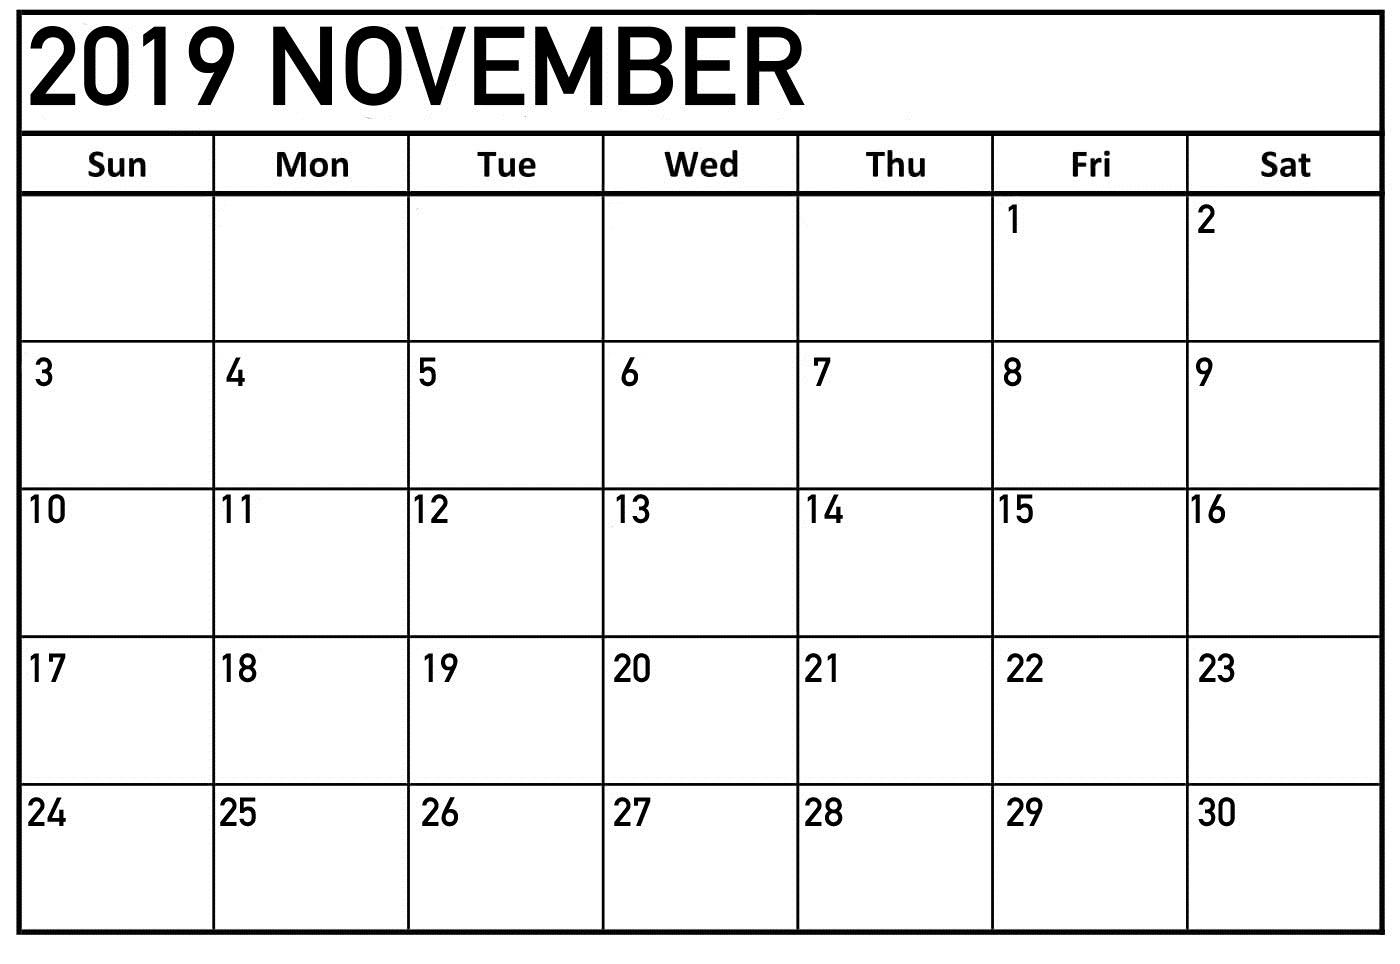 Print Monthly Calendar - Tunu.redmini.co